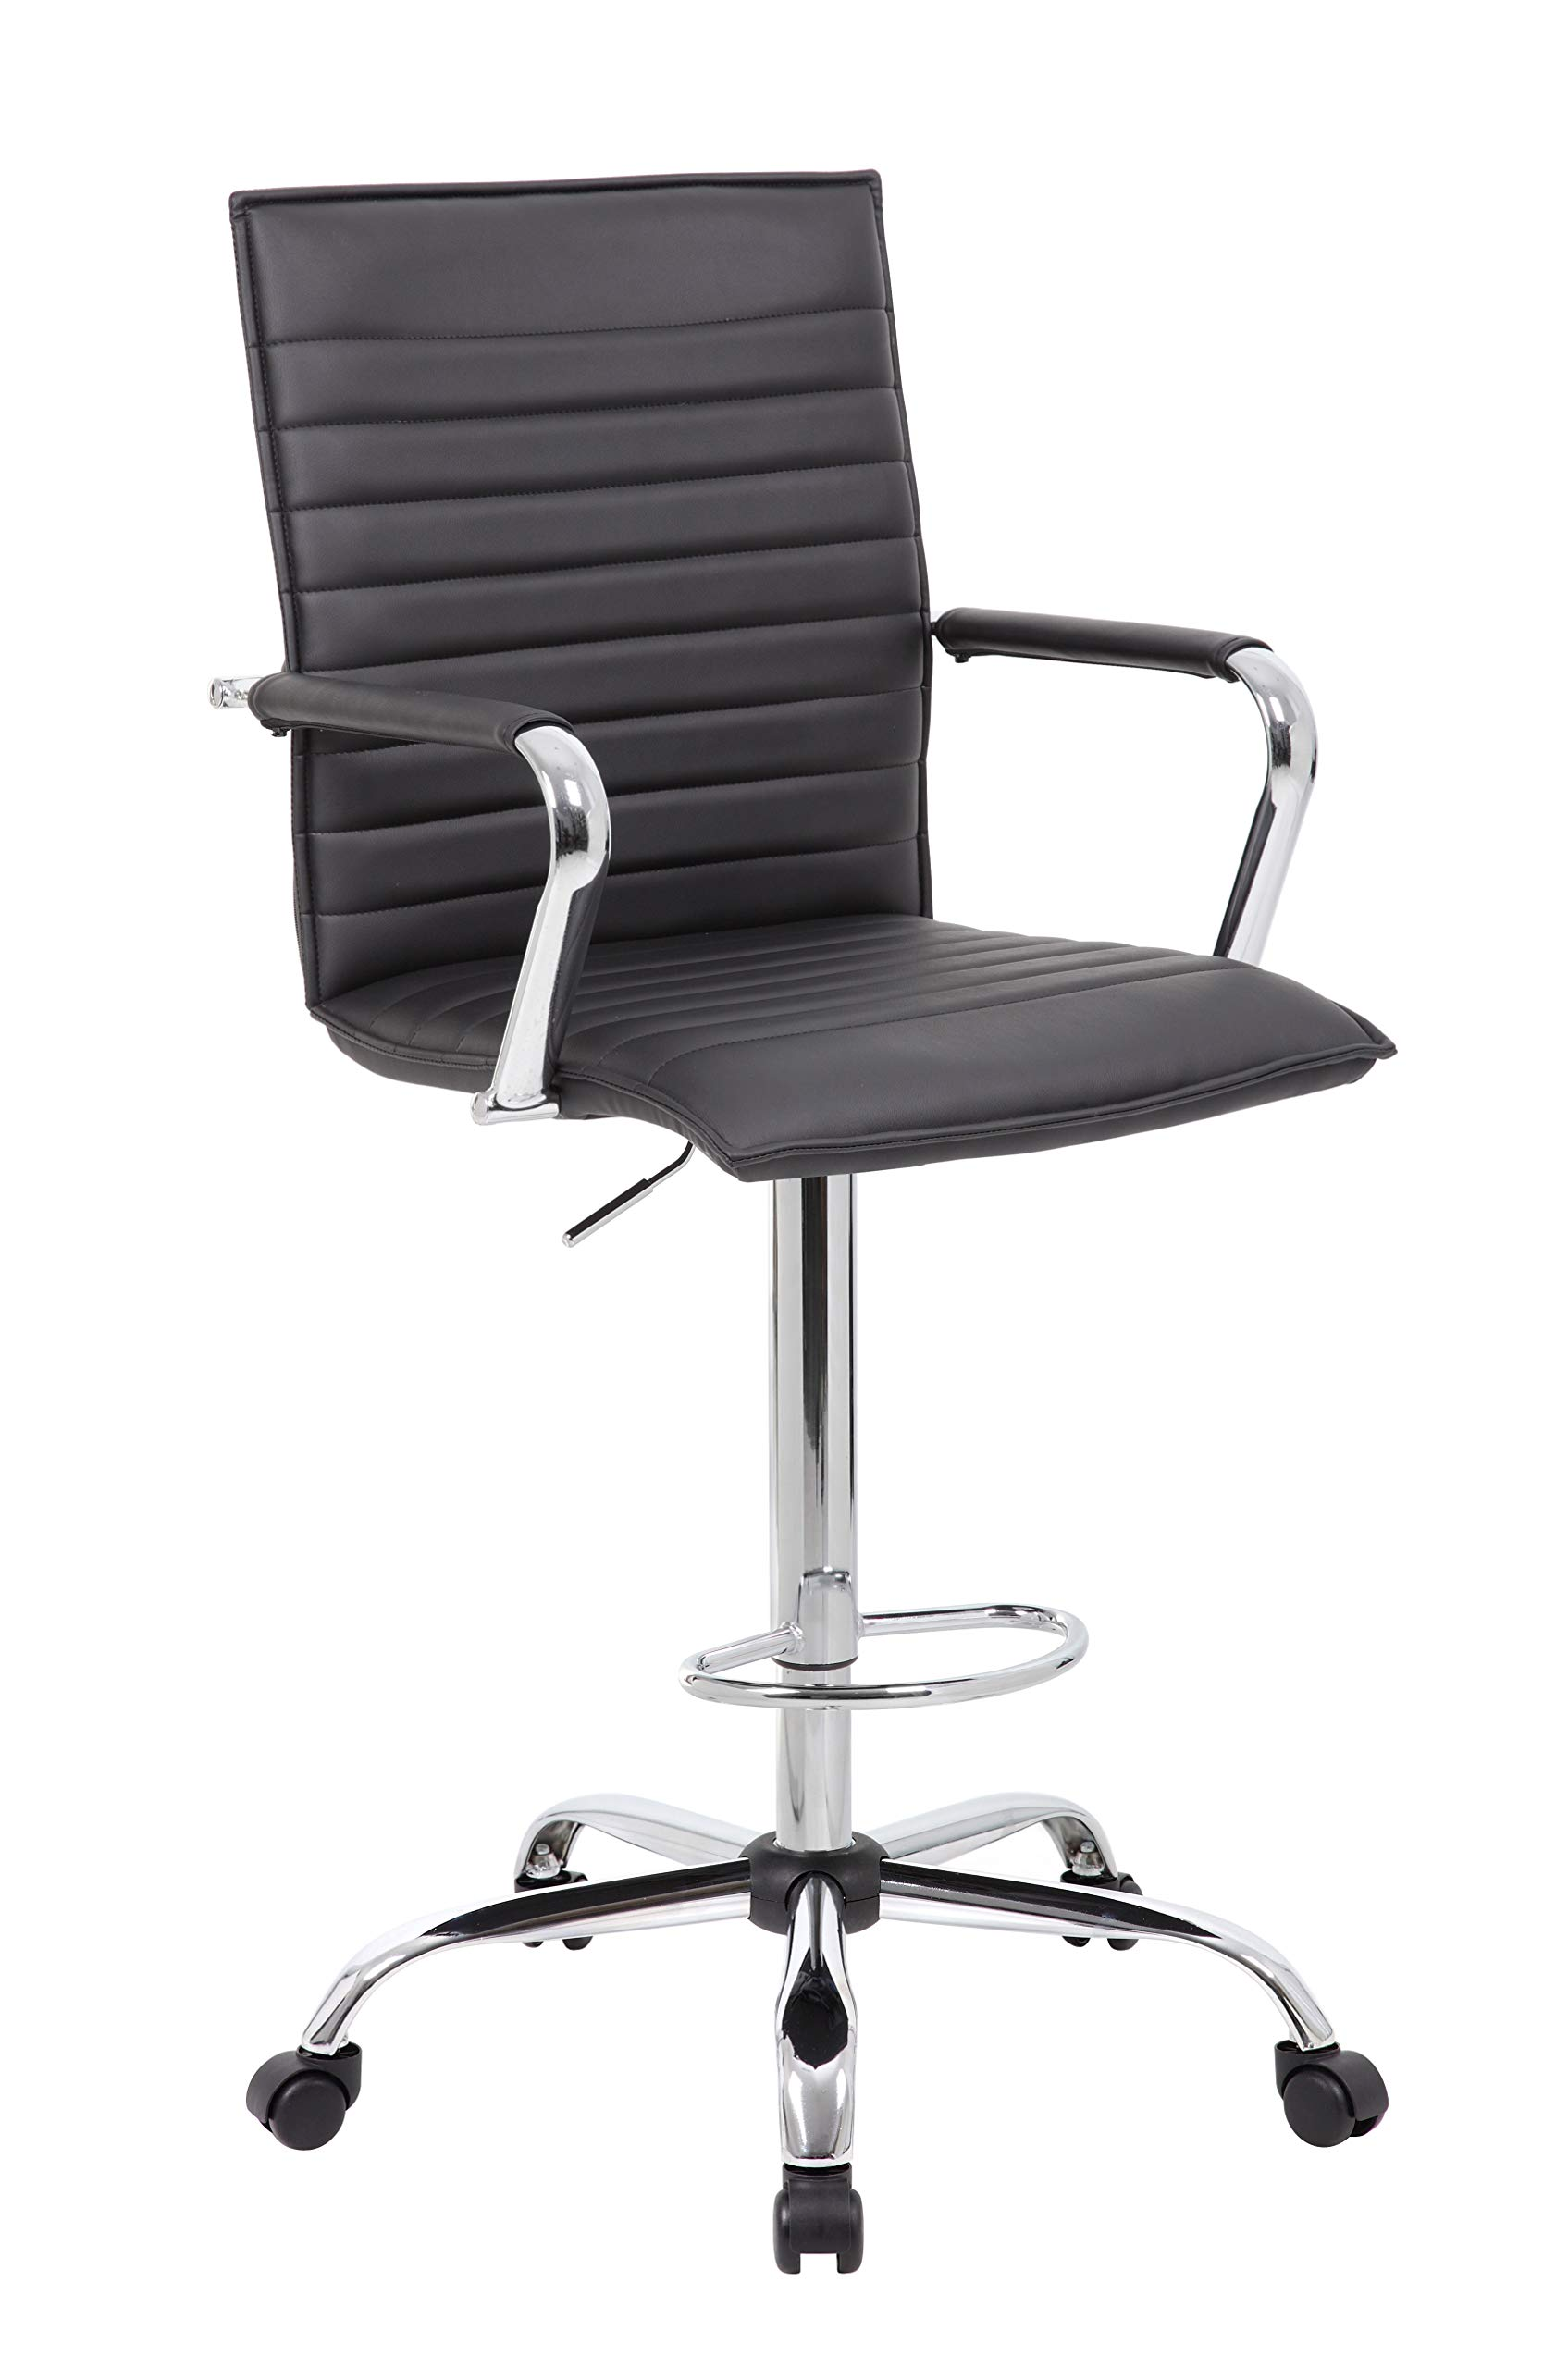 Boss Office Products B16533C-BK Drafting Stool, Black